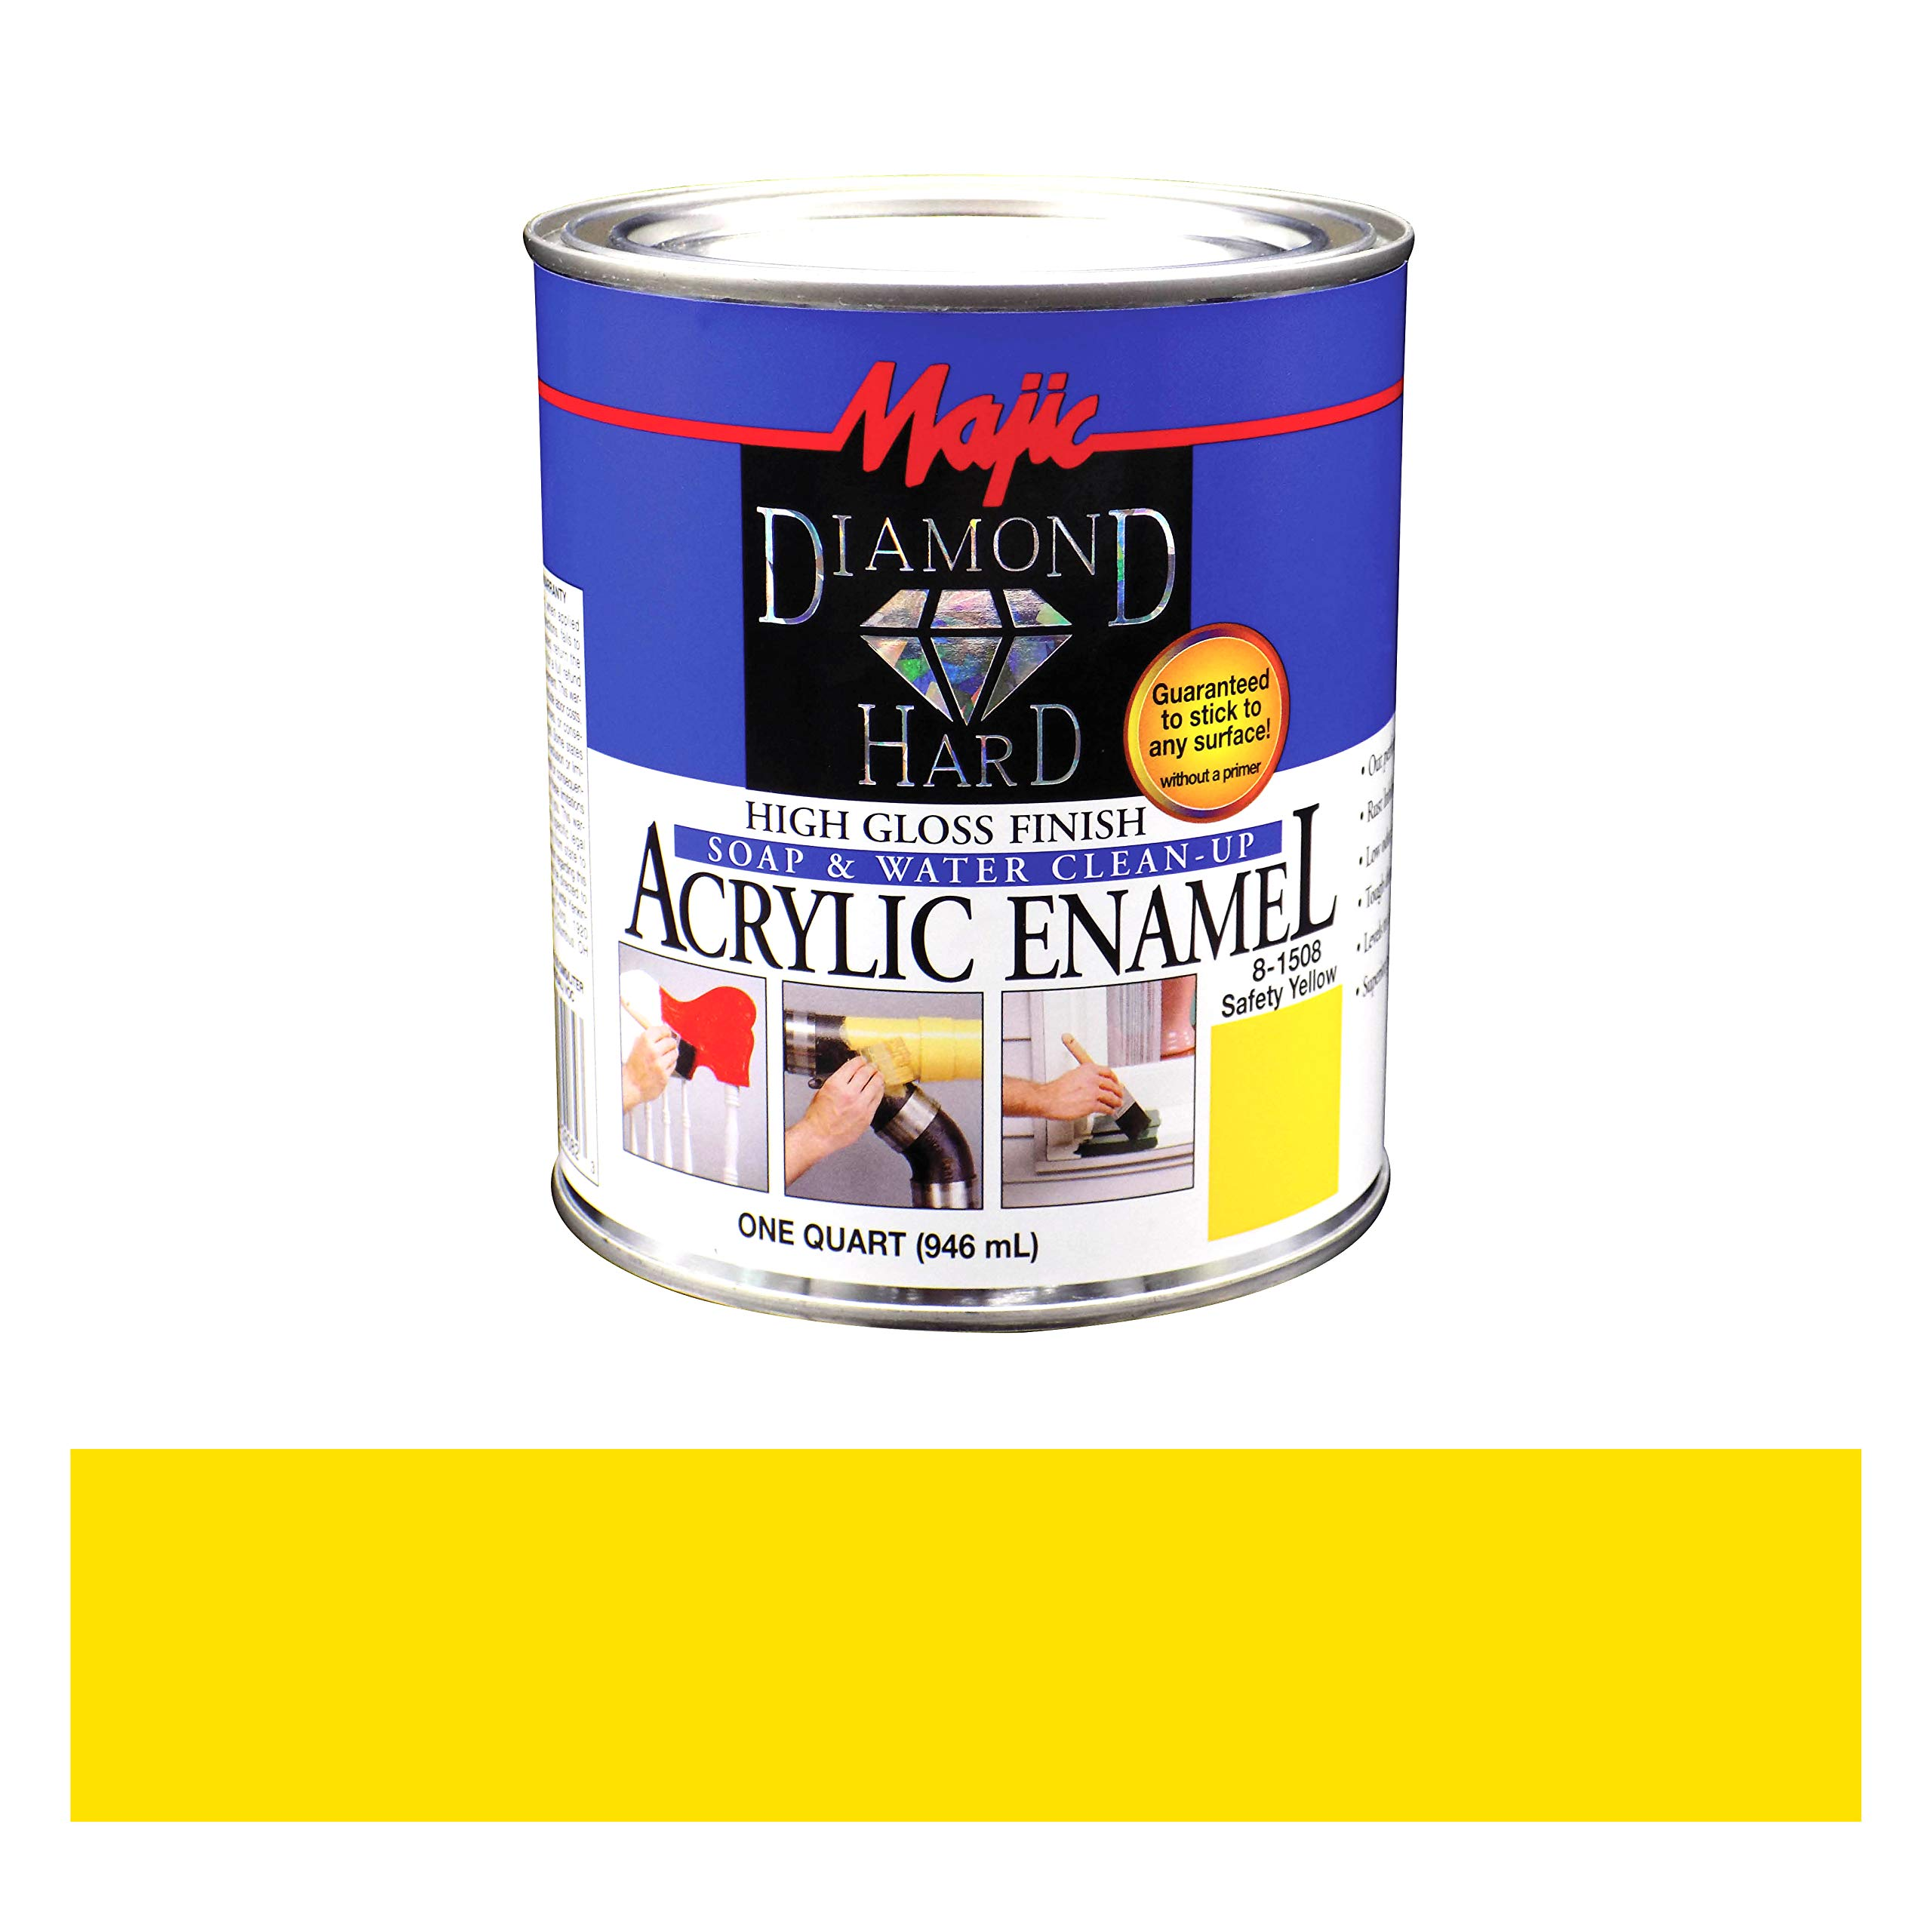 Majic Paints 8-1508-2 Diamond Hard Acrylic Enamel High Gloss Paint, 1- Quart, Safety Yellow